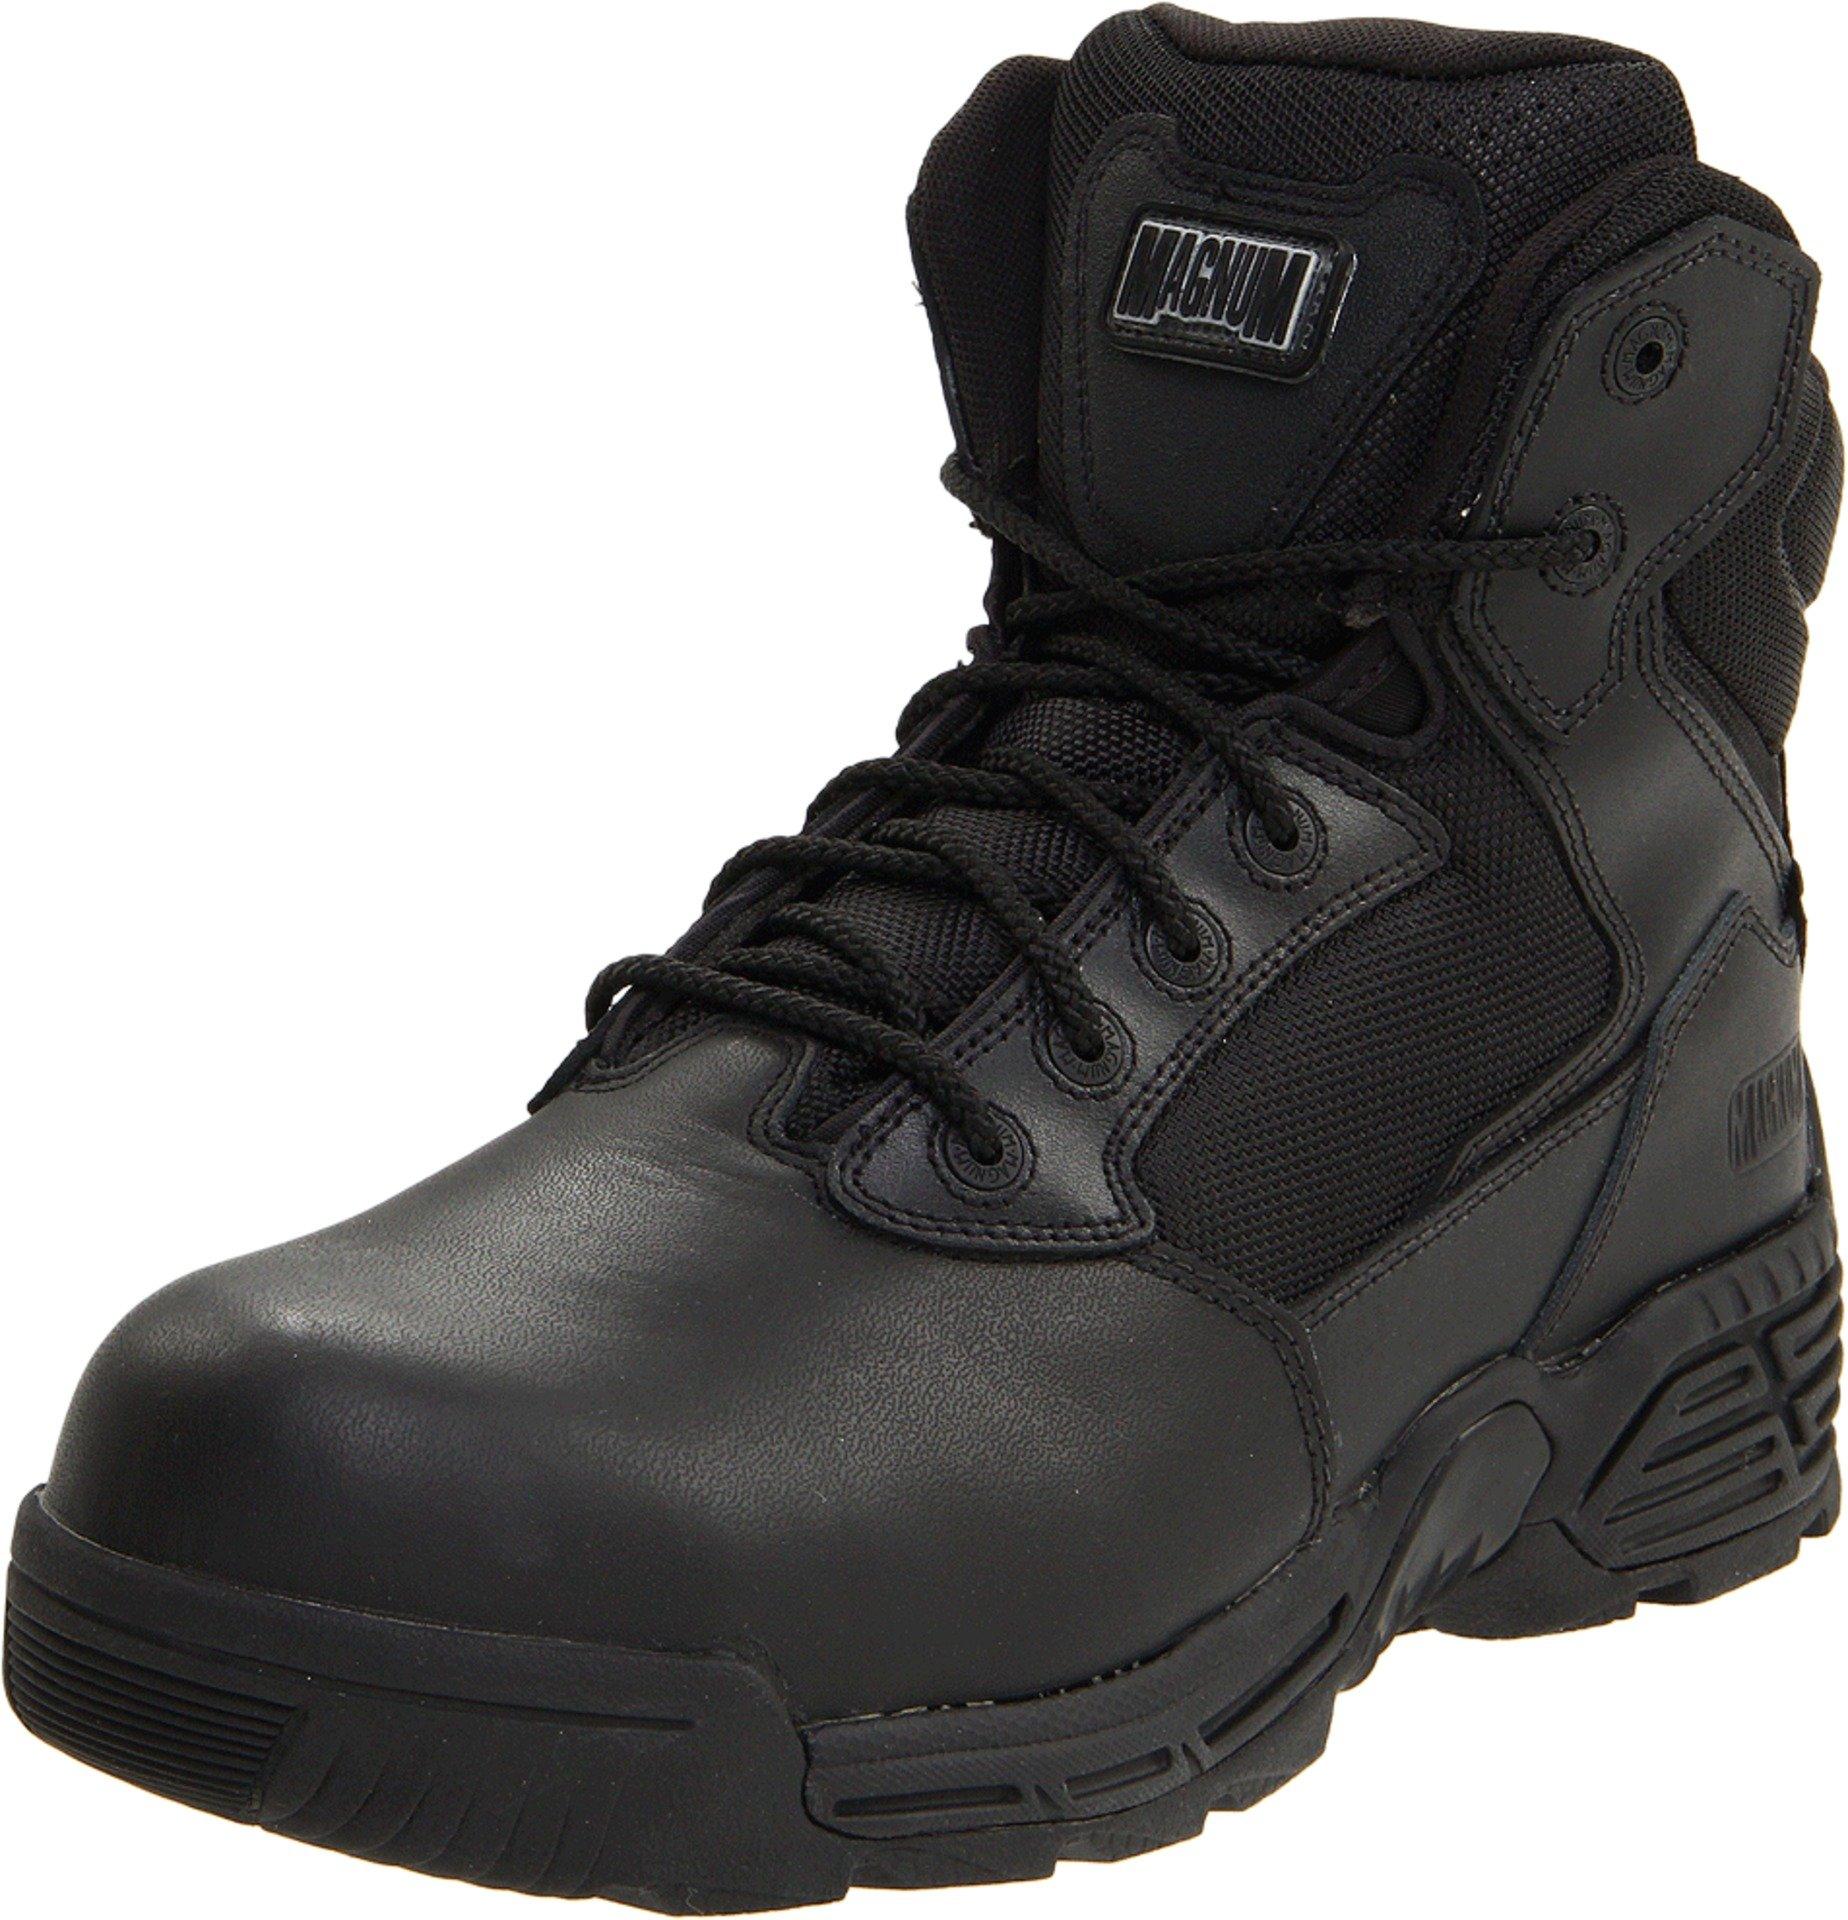 Magnum Men's Stealth Force 6.0 Sz Comp Toe Boot,Black,13 M US